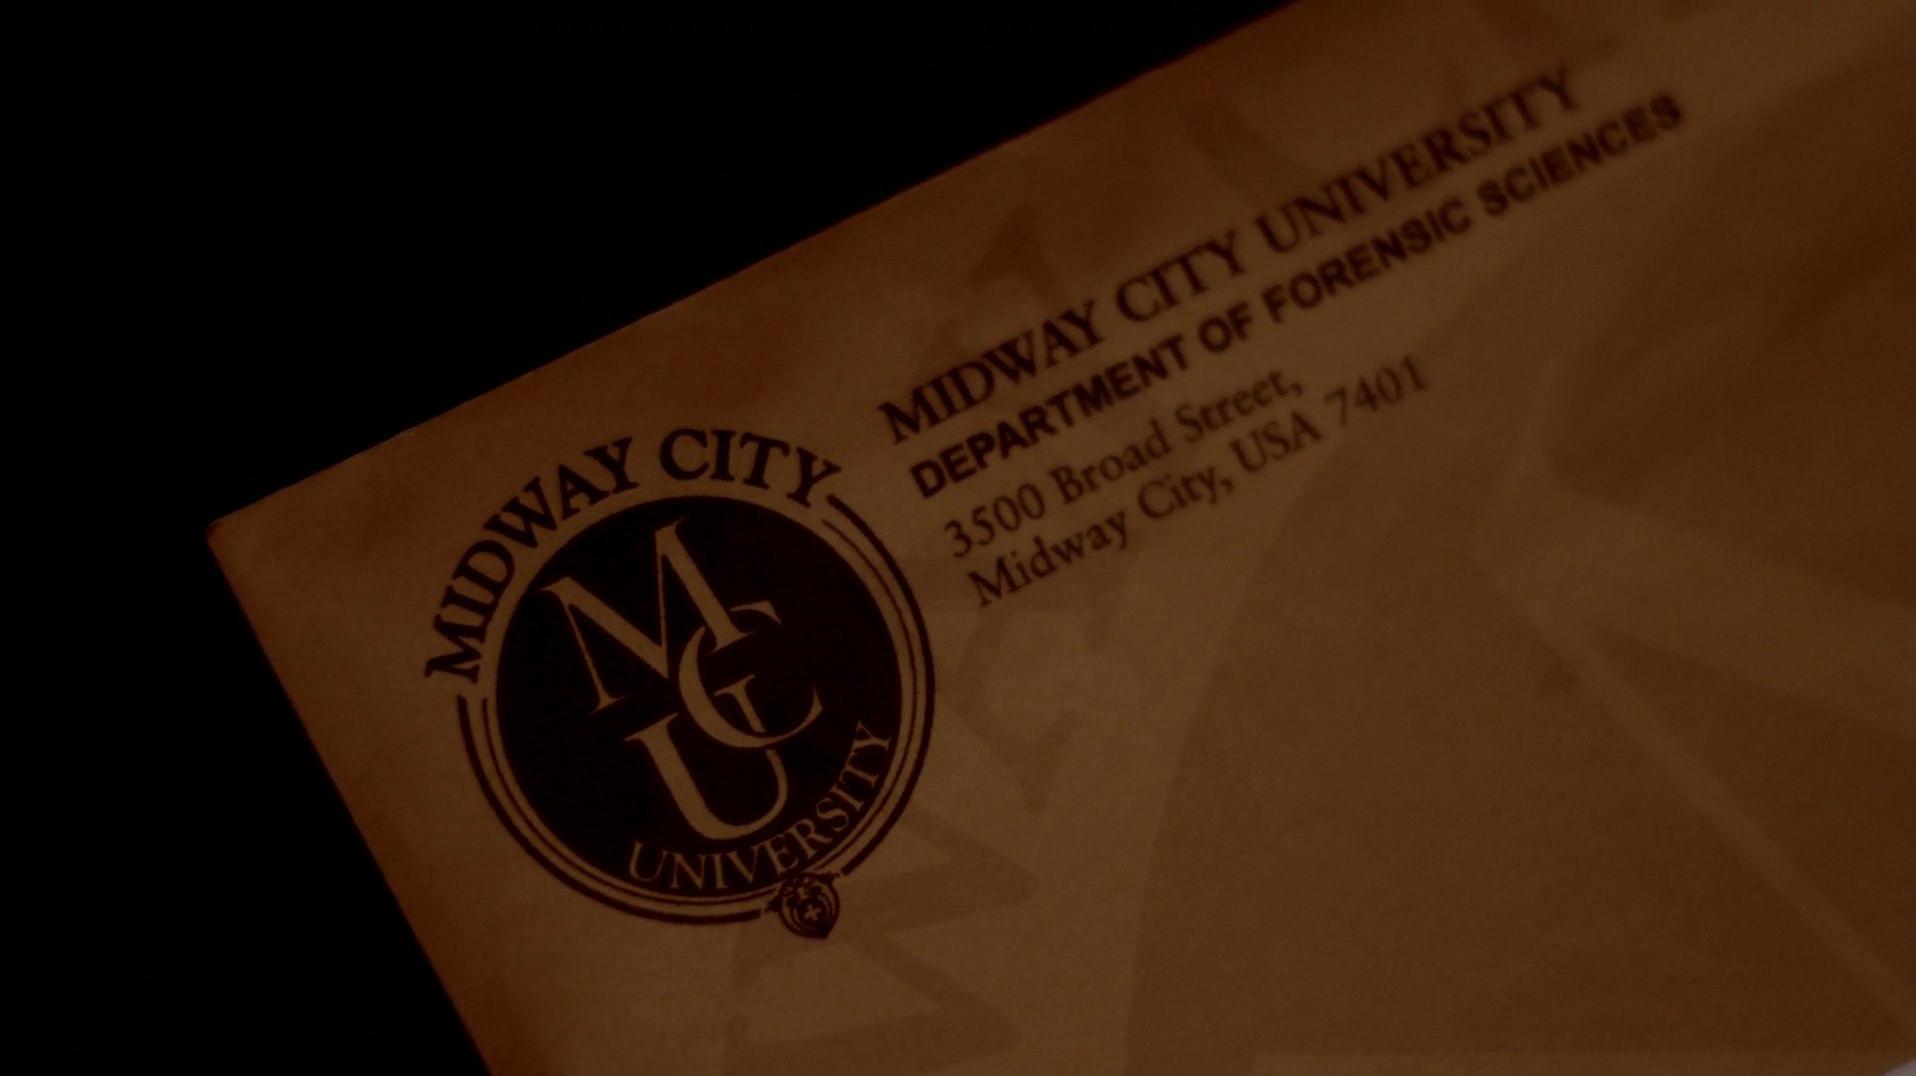 Midway City University